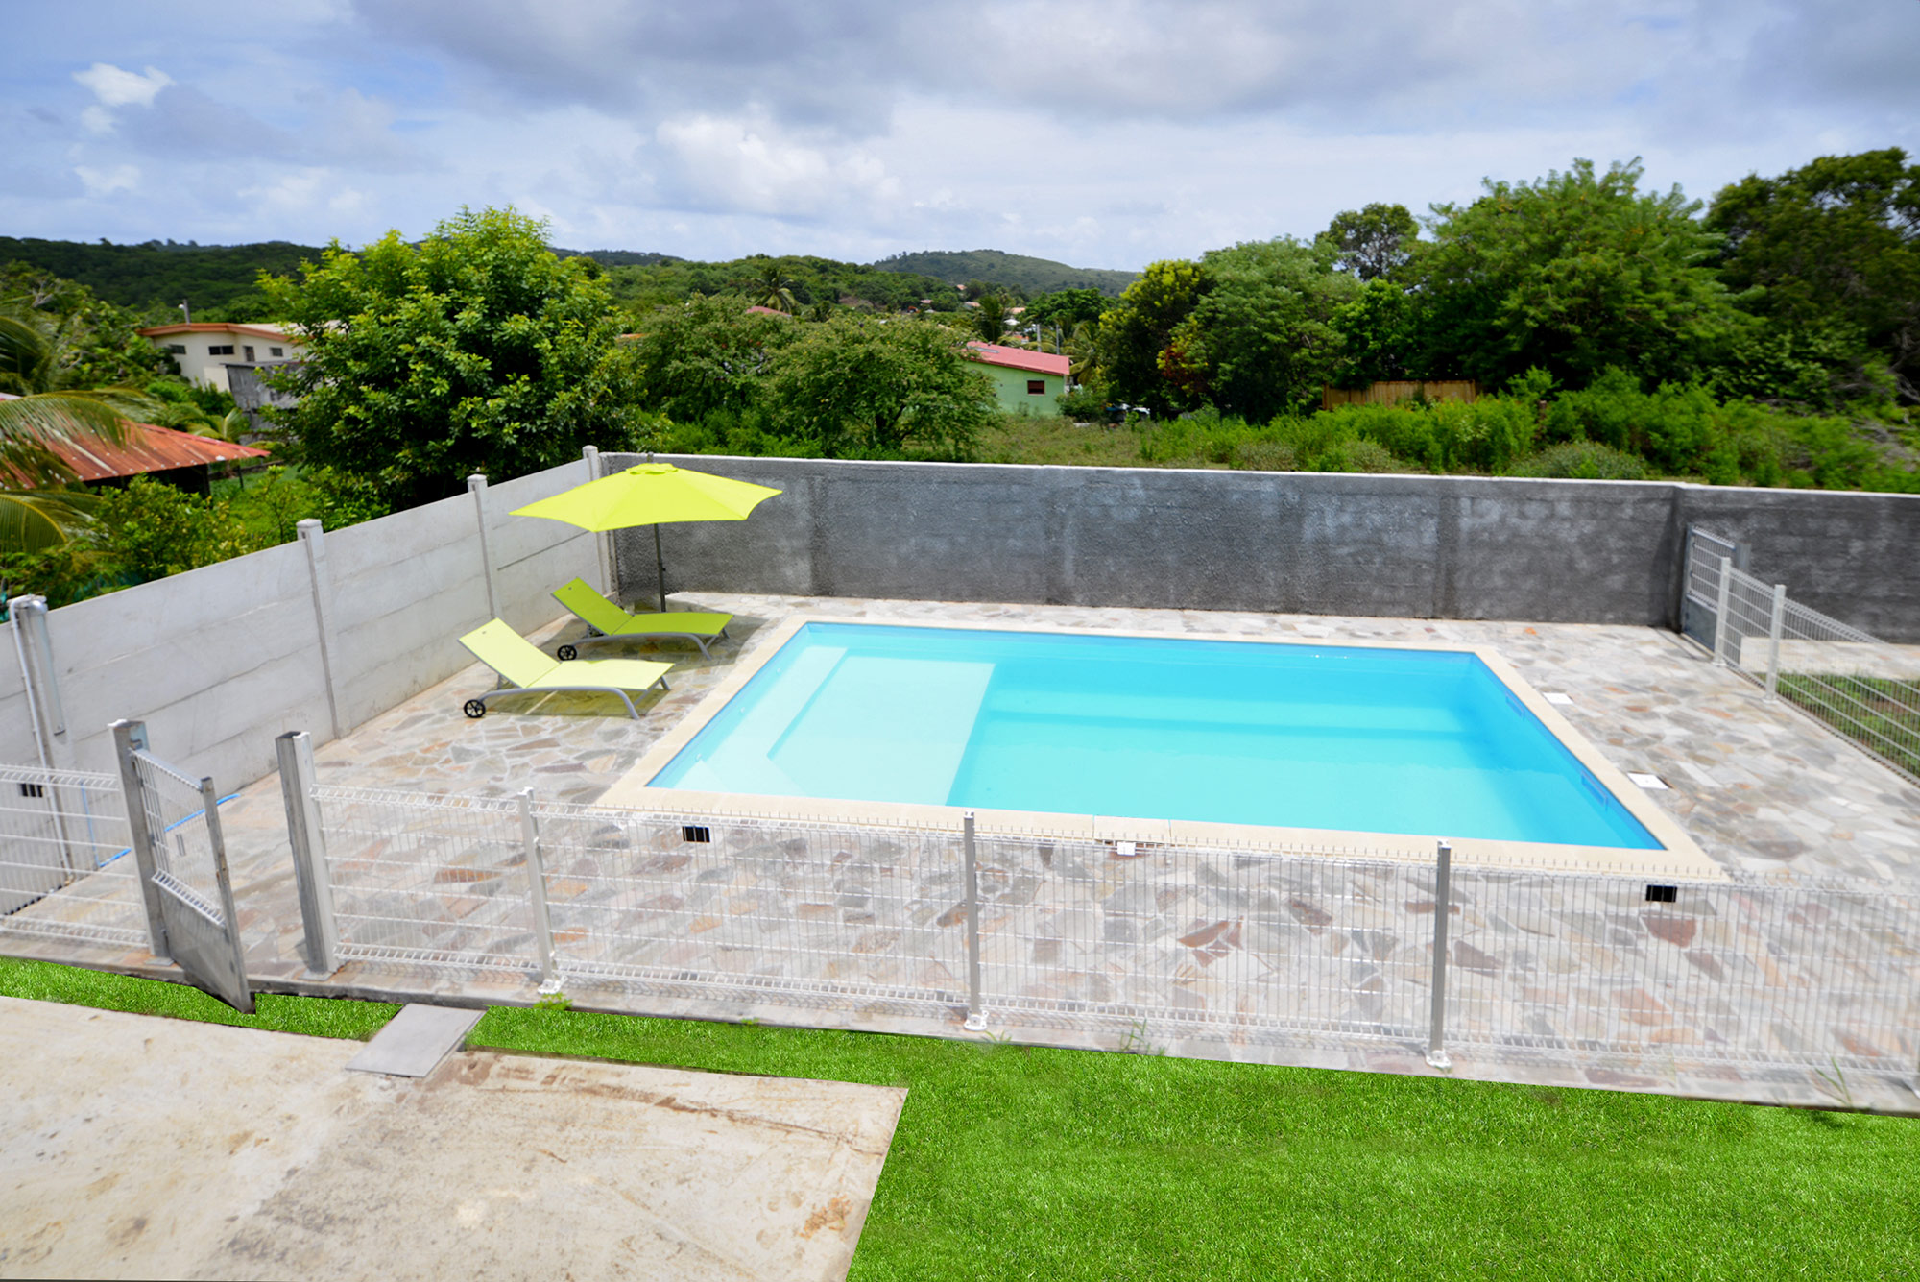 Carib Palma Cote Jardin Location De Vacances Martinique